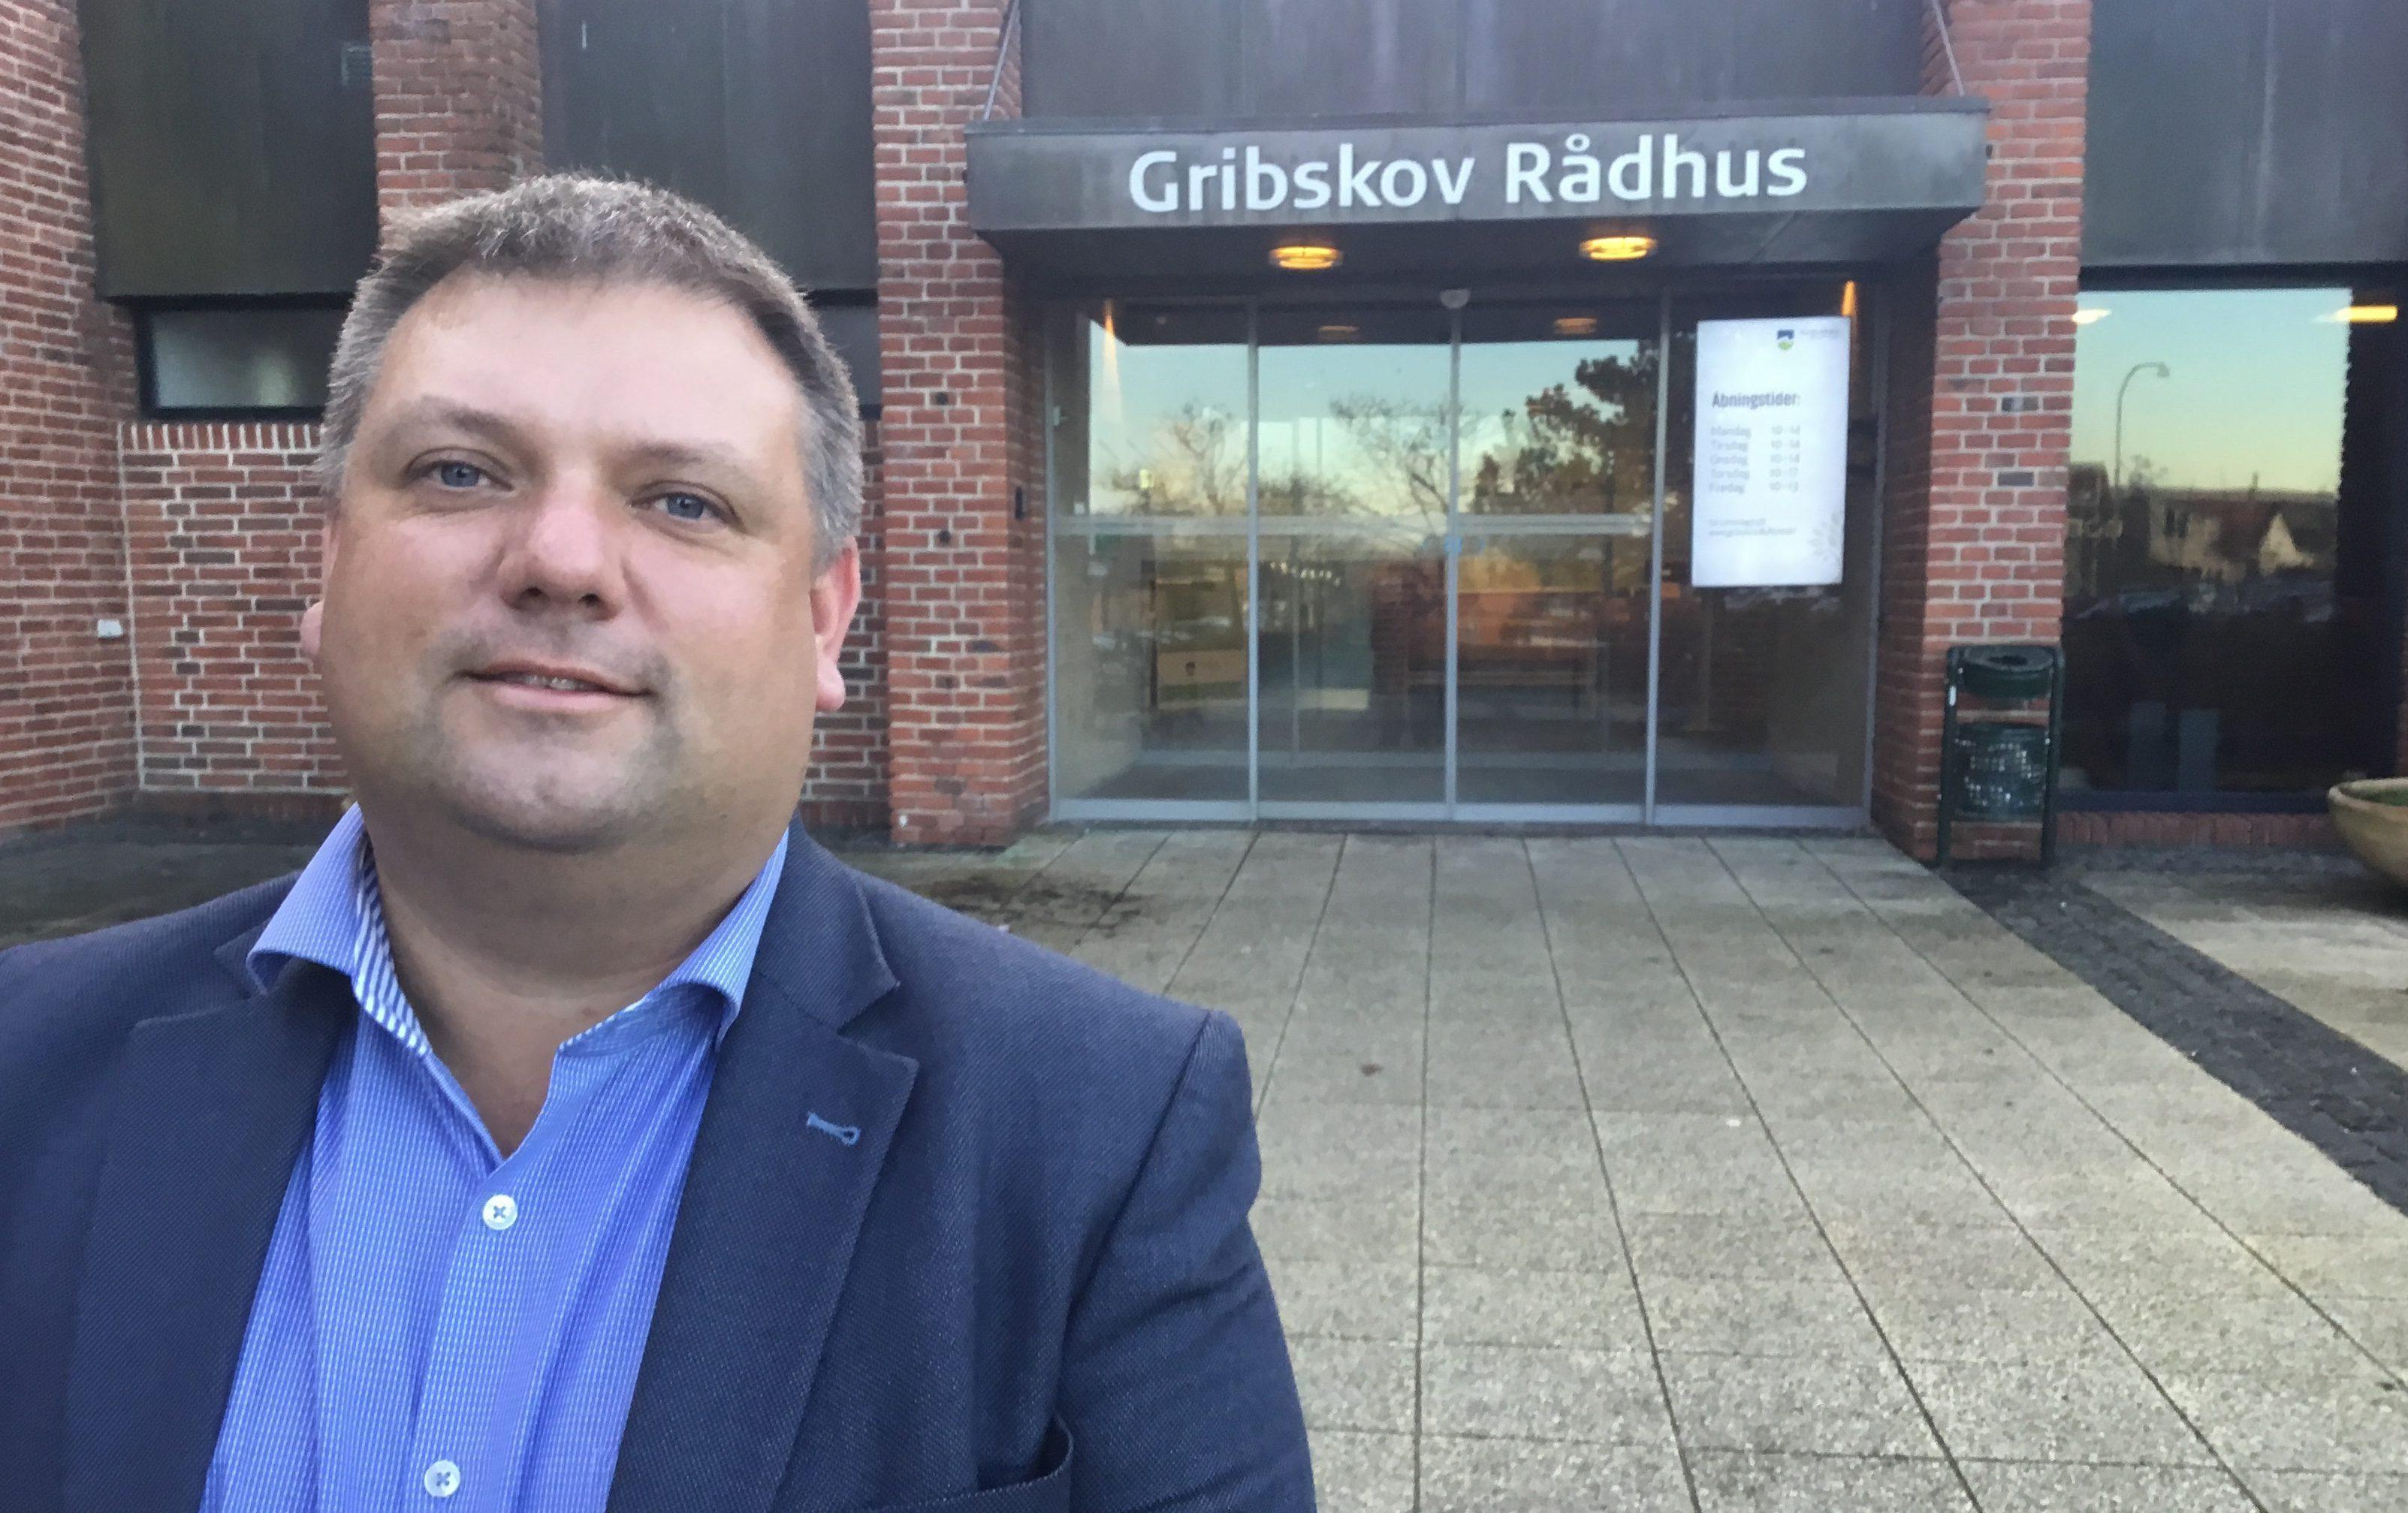 Anbud365: Konkurranseutsettings-ivrig kommune dropper konkurranseutsetting